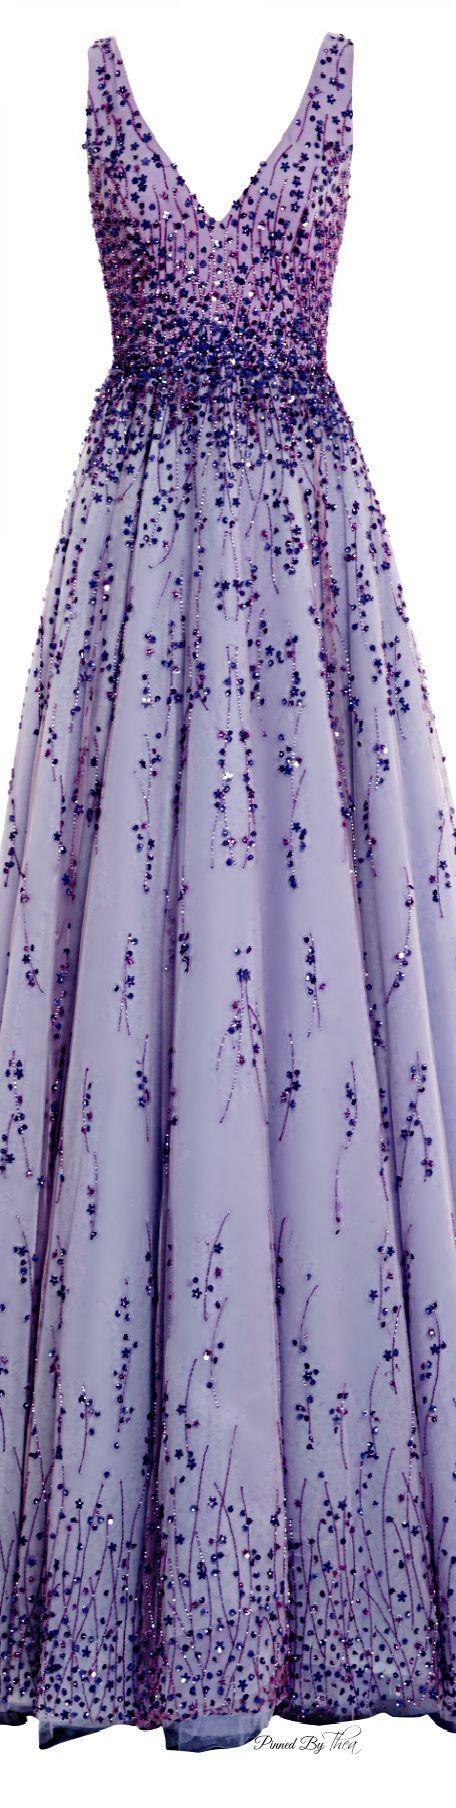 Monique Lhuillier ● SS 2015, Violet Tulle Ball Gown                                                                                                                                                      More